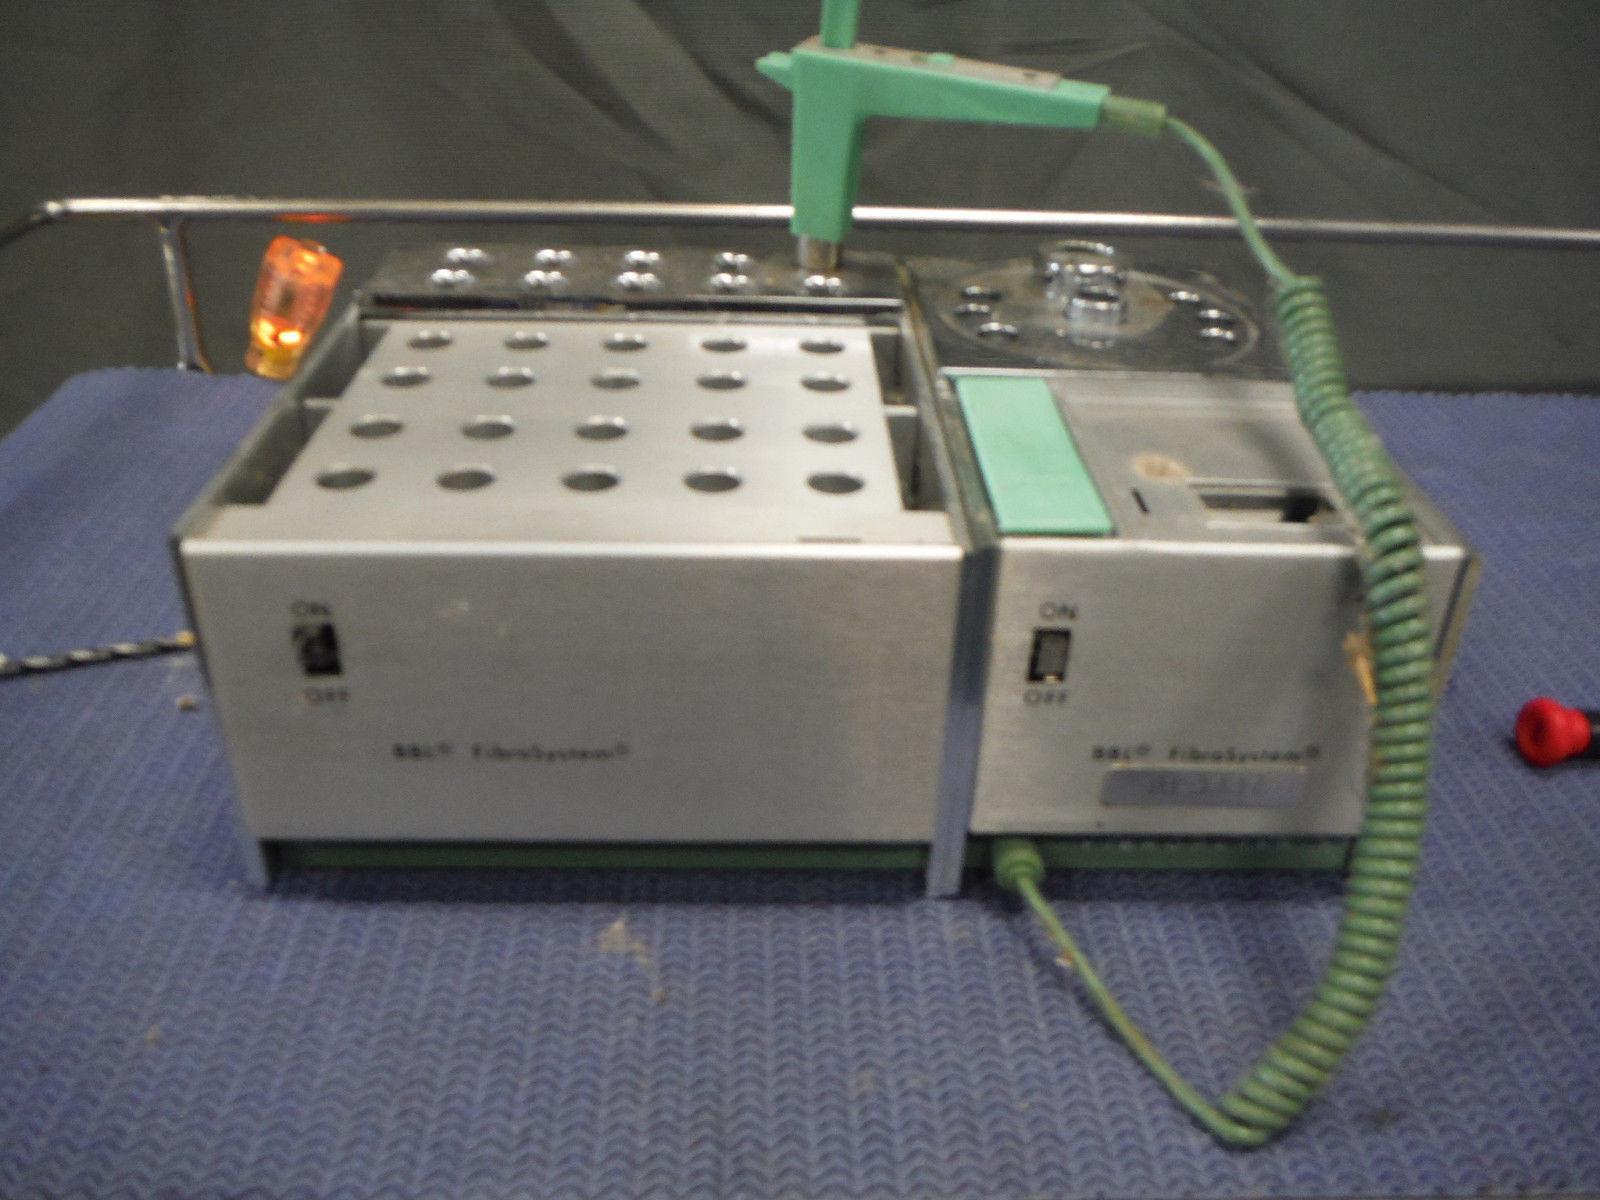 Becton BBL FibroSystem 60419 Thermal Prep Block & 60415 Coagulation Timer